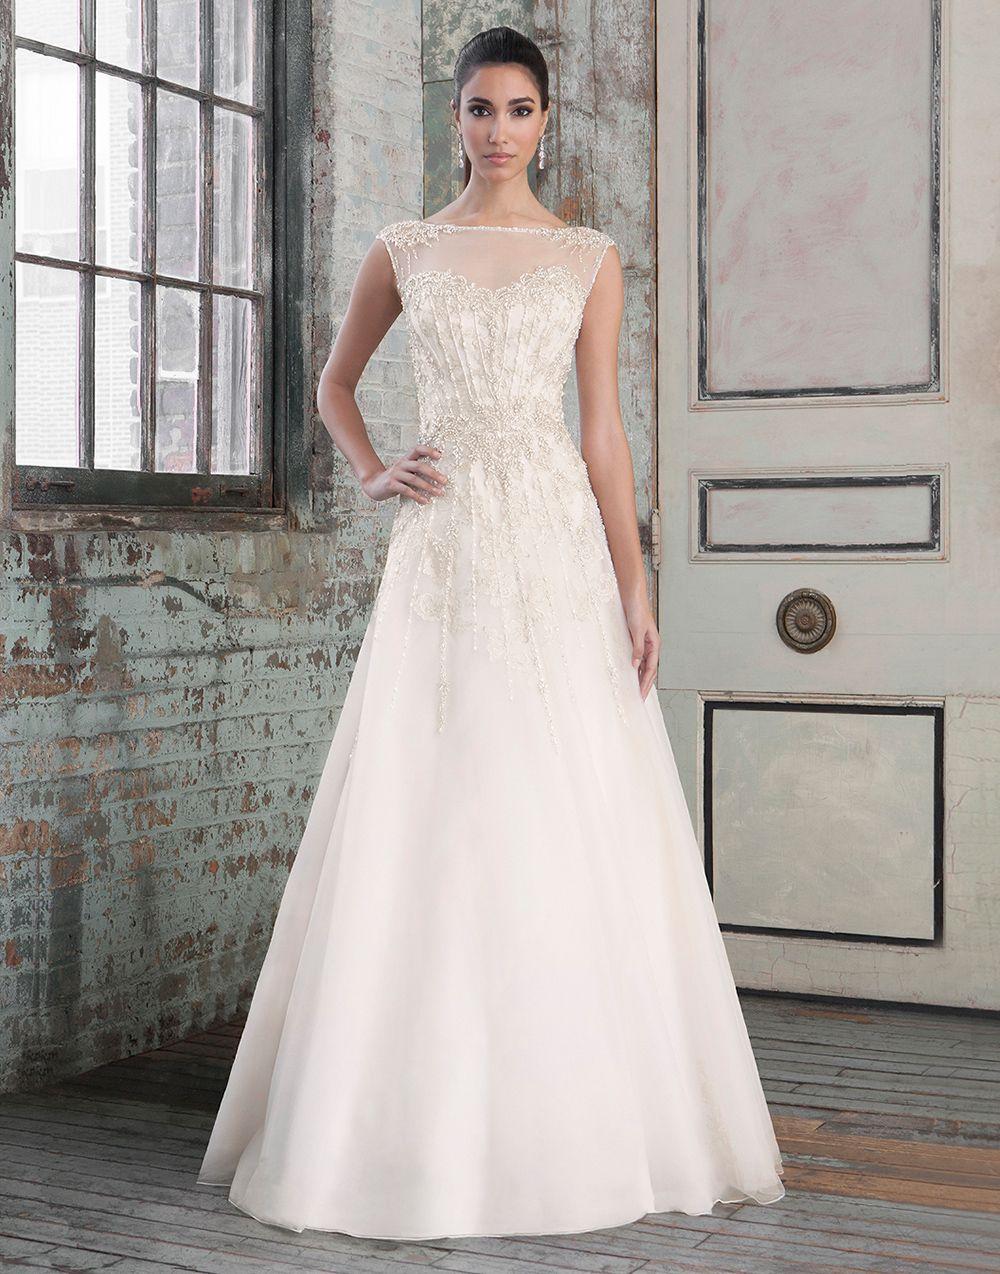 Justin Alexander Signature Wedding Dresses Style 9780